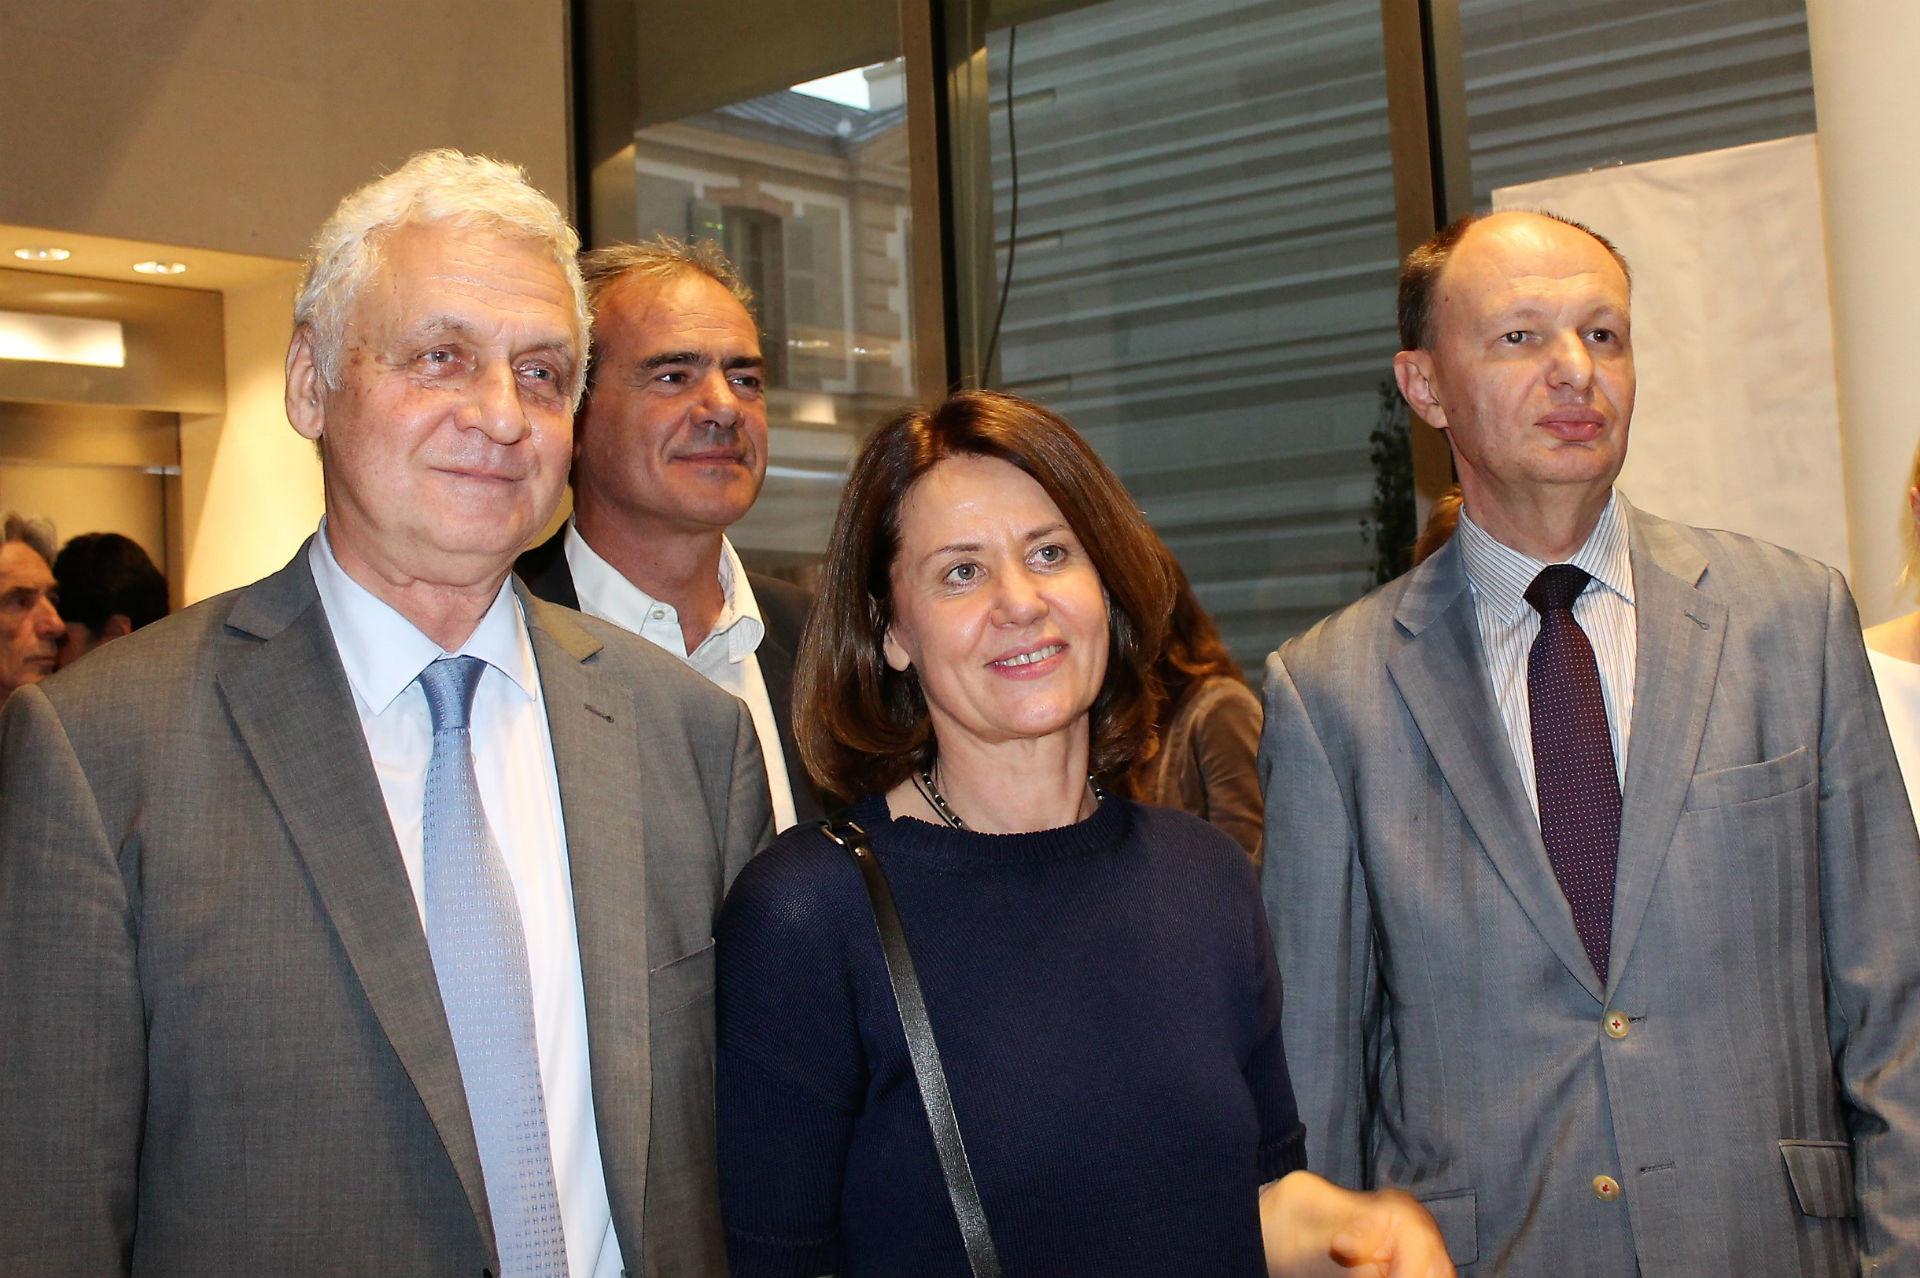 L'ambassadeur de Russie Alexandre Orlov, Présidente du salon Russkaya Literatura Irina Rekchan, le ministre des communications russe Mikhaïl Seslavinsky.